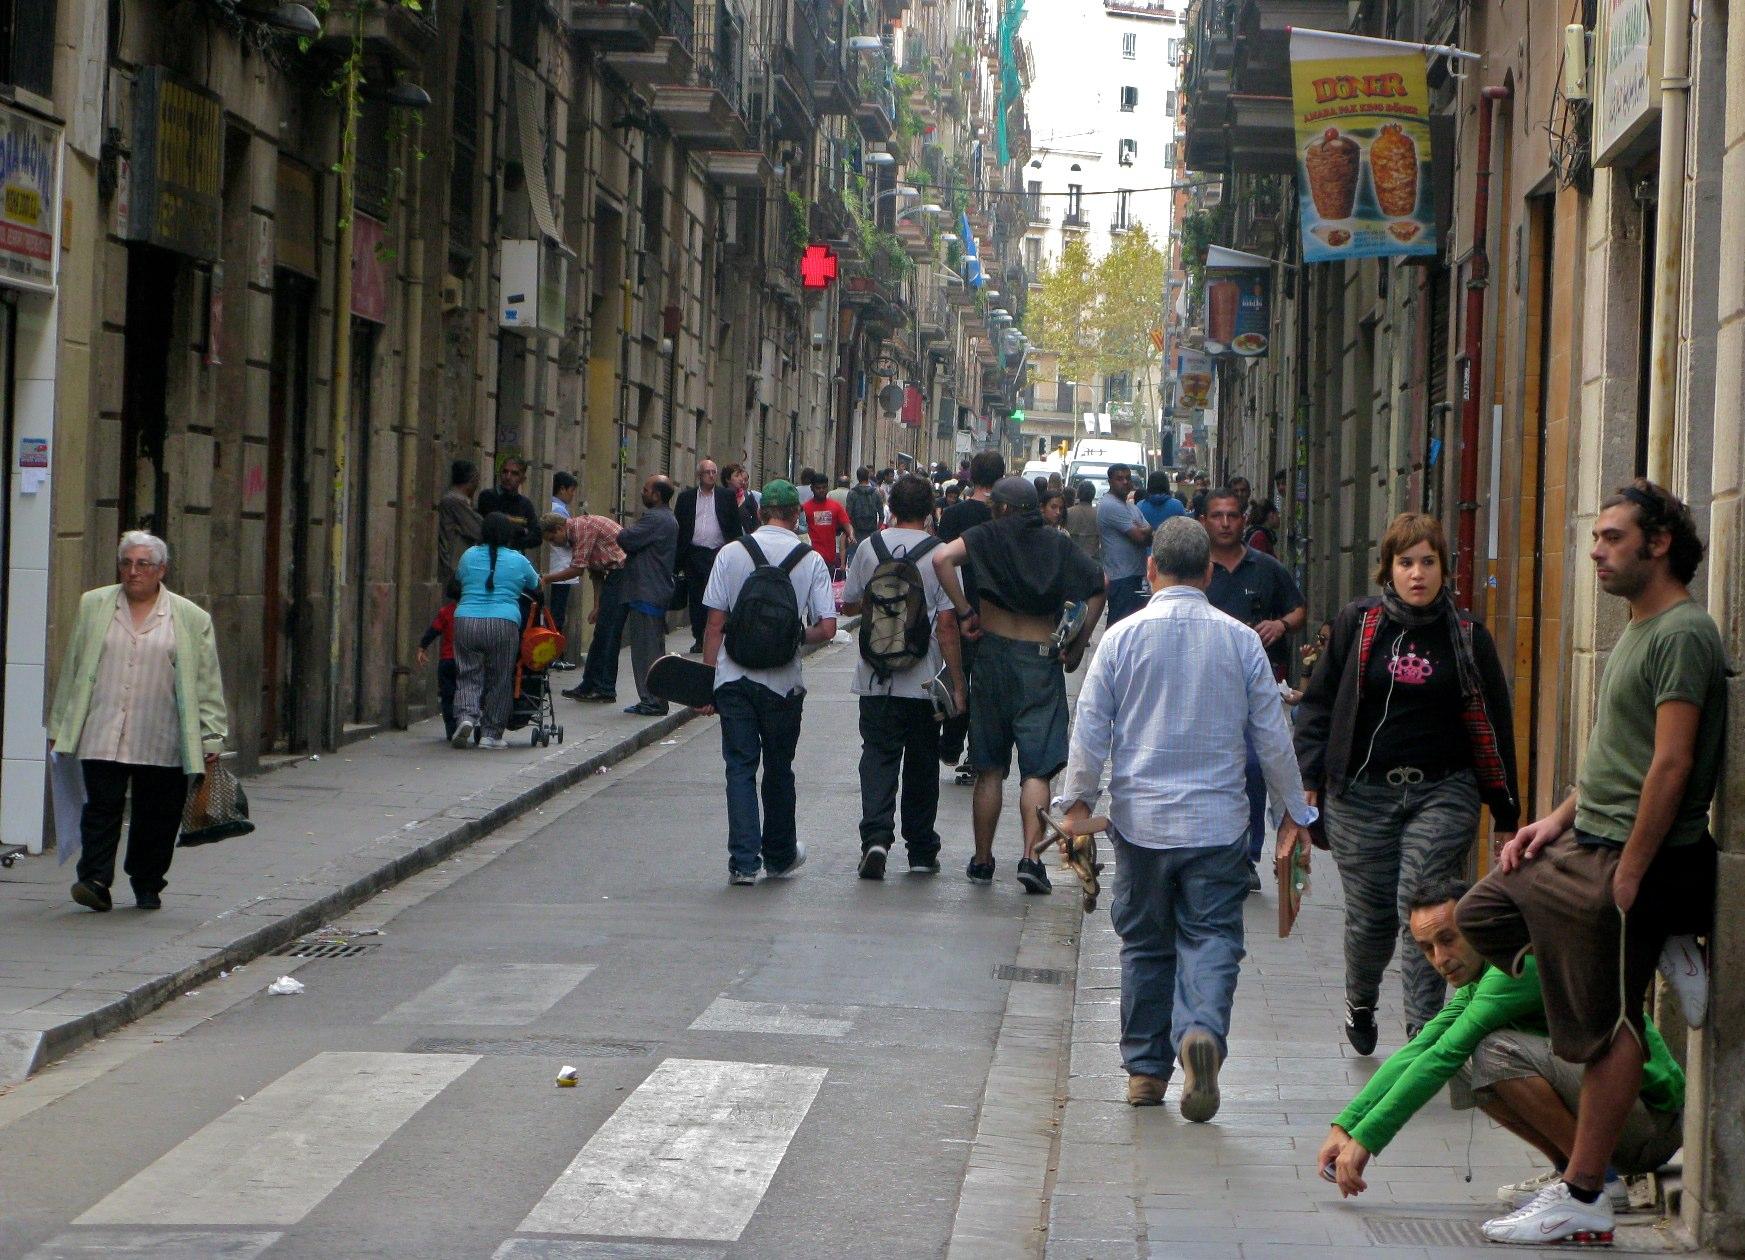 zona de prostitutas en barcelona me gustan las prostitutas